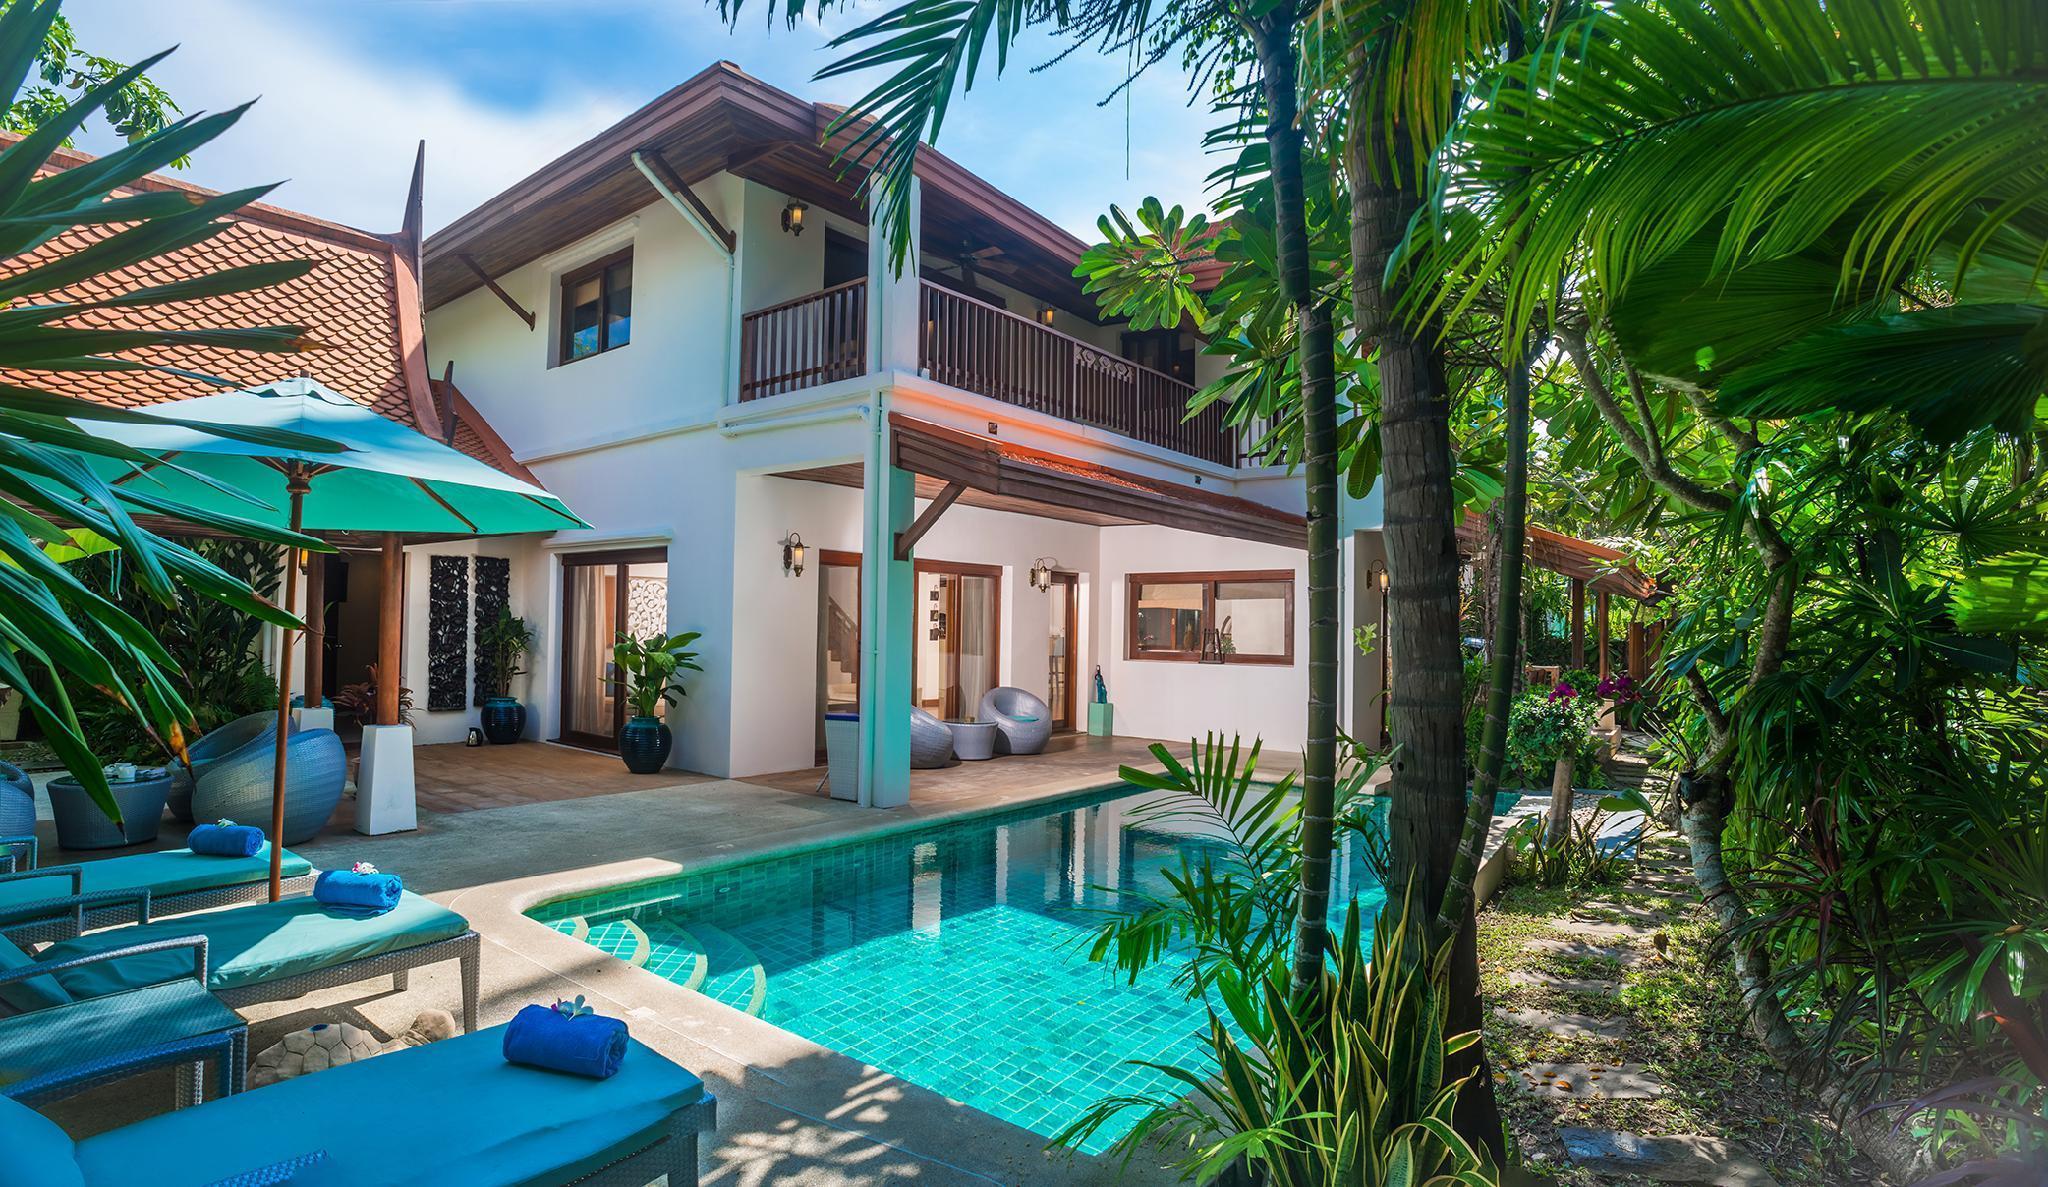 Beachfront Resort Villa Baan Tawan 3BR 3 ห้องนอน 3 ห้องน้ำส่วนตัว ขนาด 266 ตร.ม. – หัวถนน